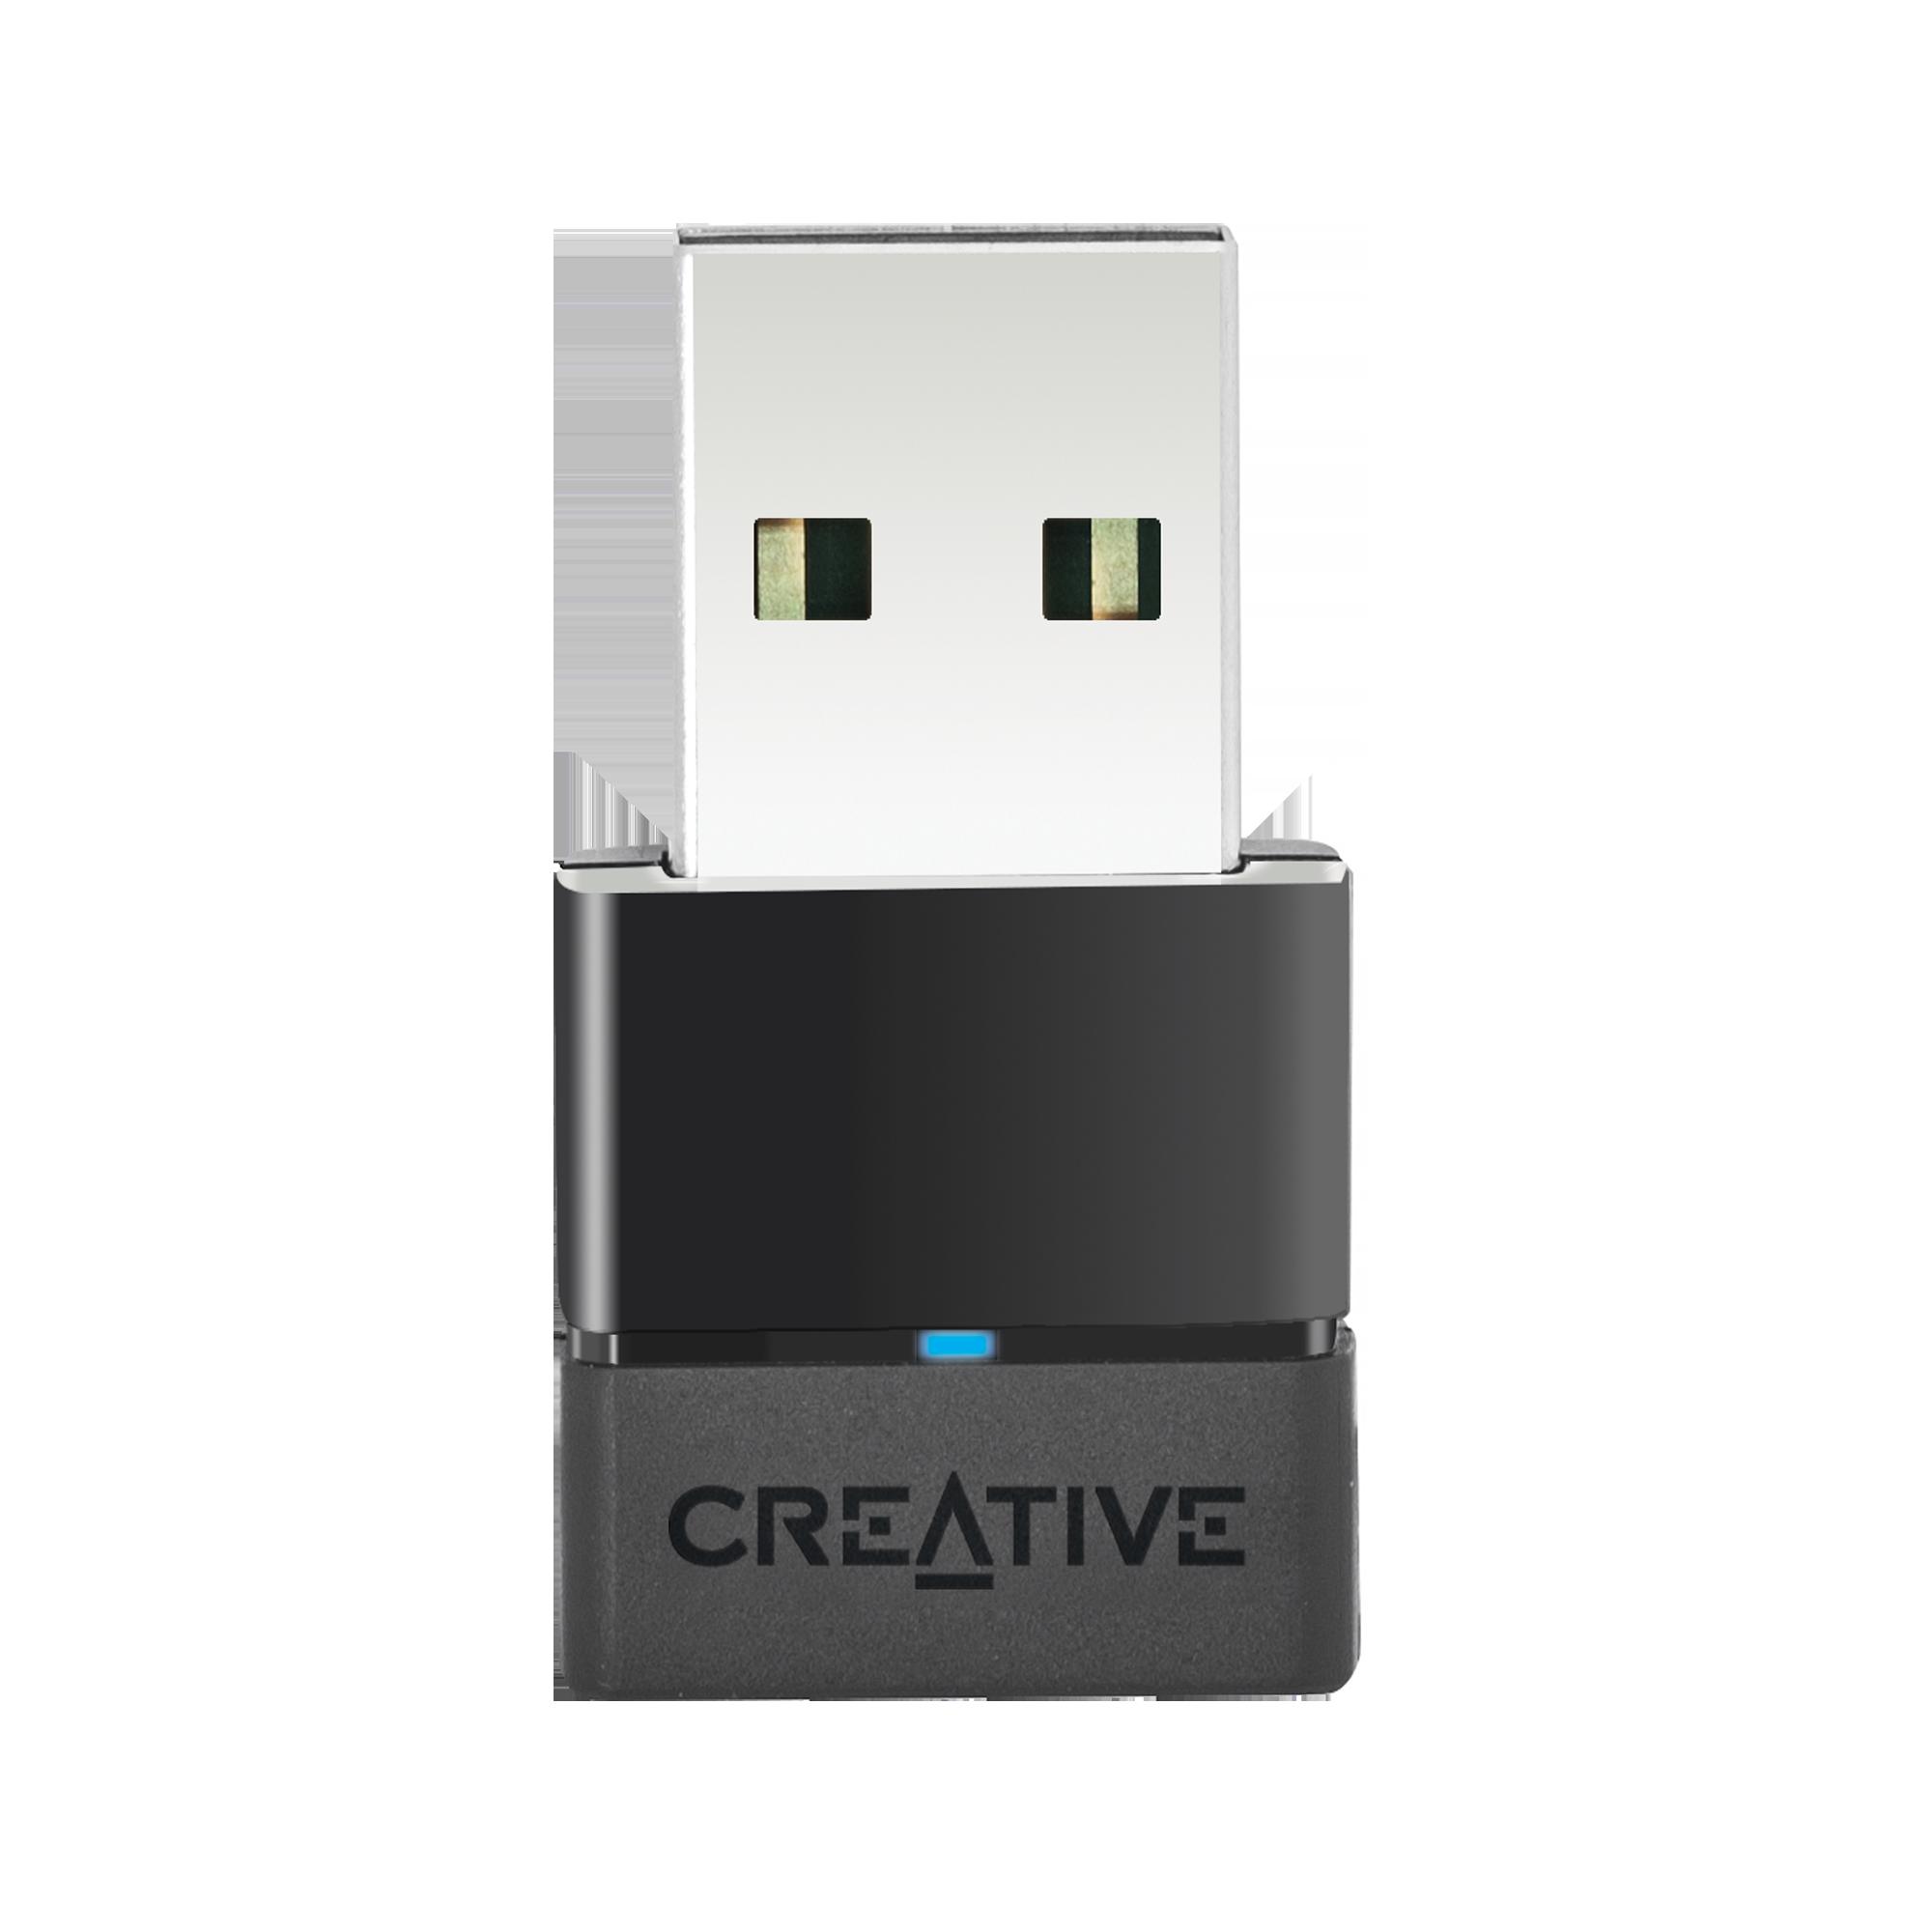 Image of Creative BT-W2